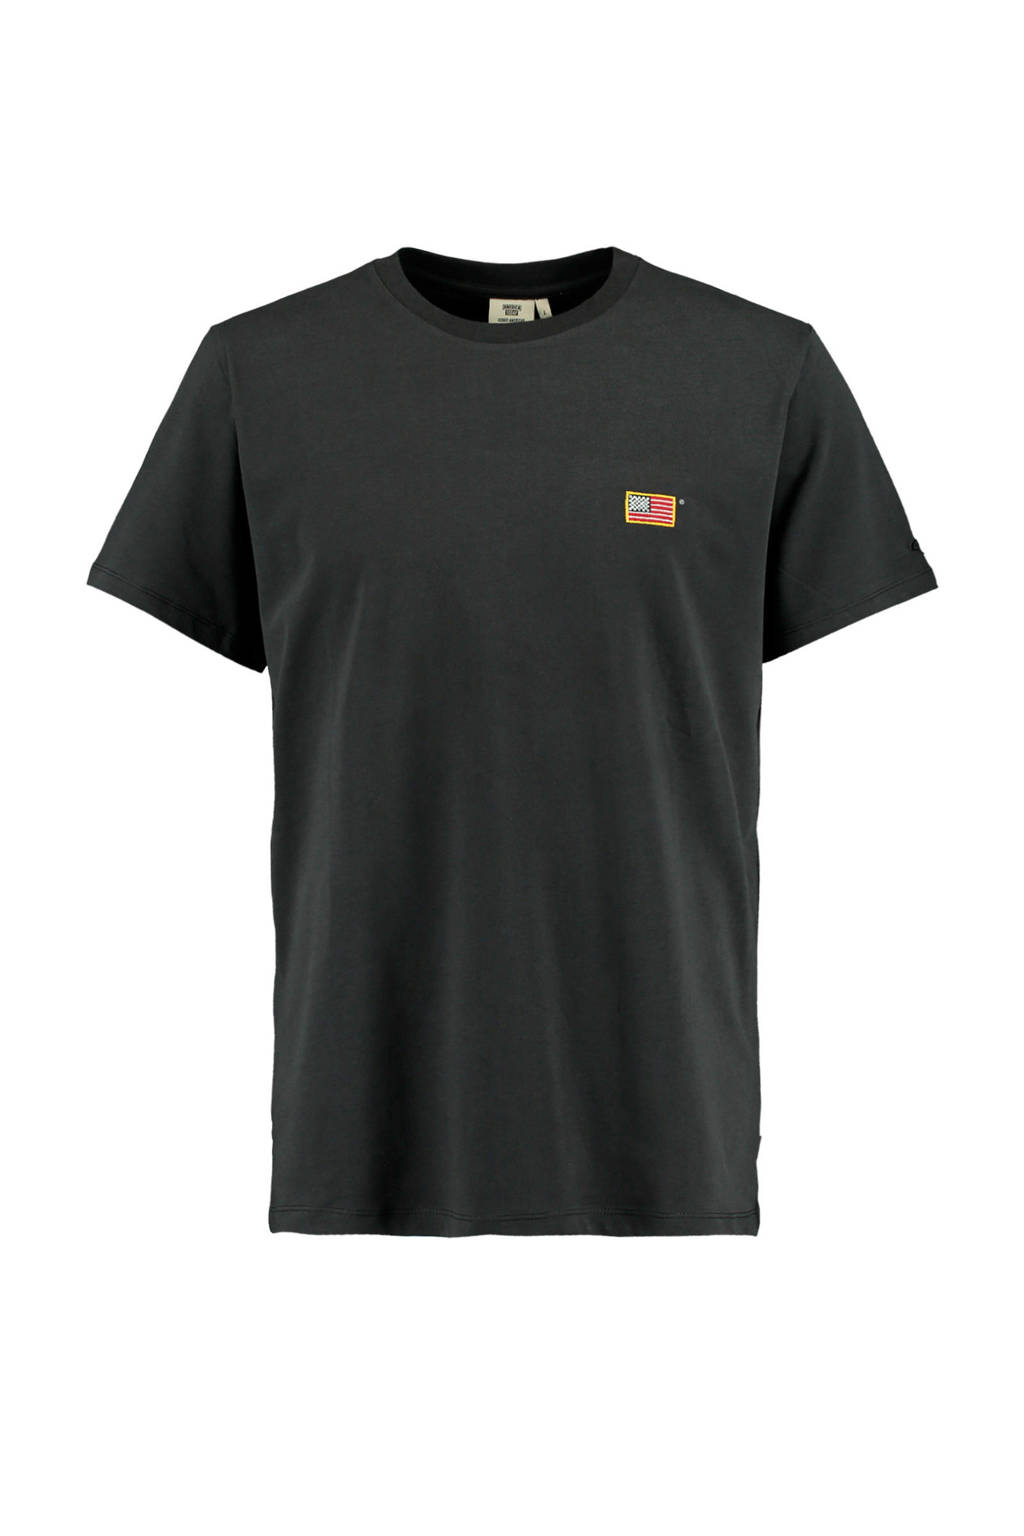 America Today T-shirt Edgar gewassen zwart, Gewassen zwart